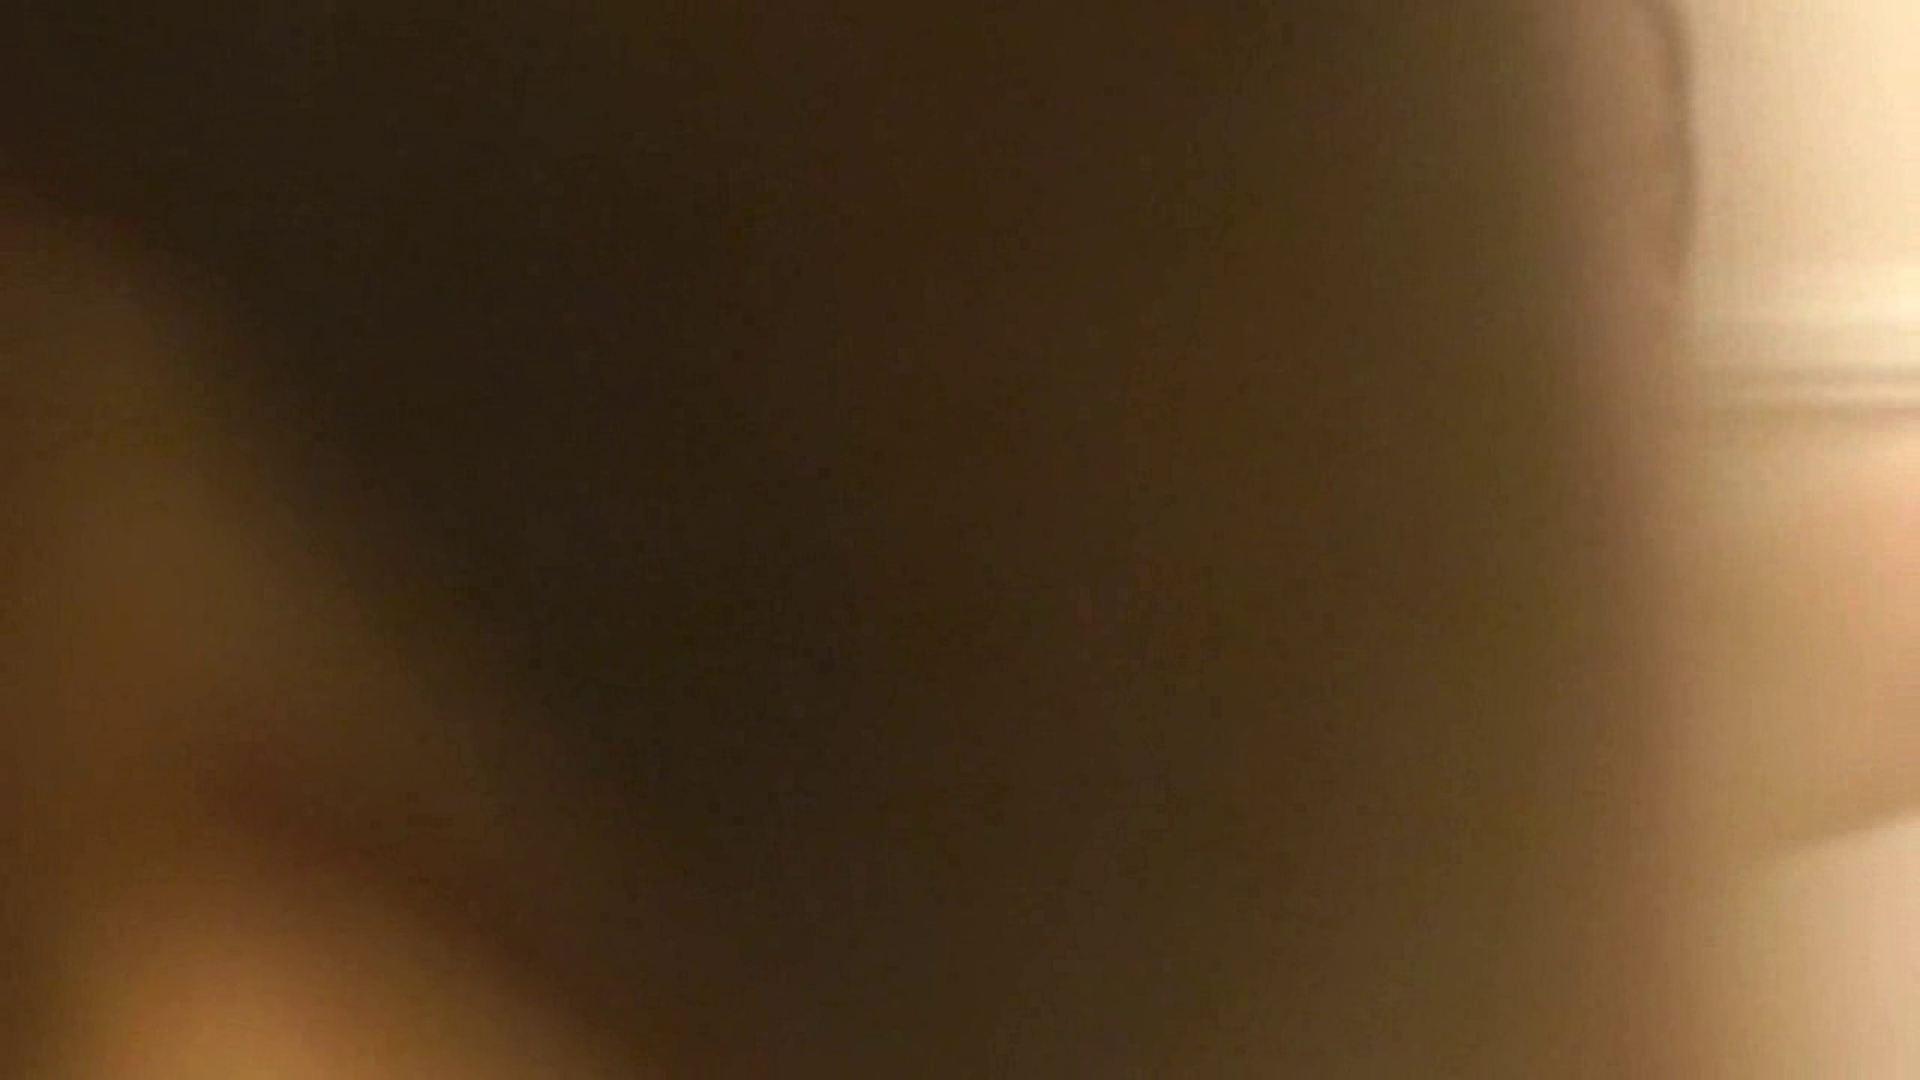 vol.1 Mayumi 窓越しに入浴シーン撮影に成功 入浴中の女性  57PIX 24